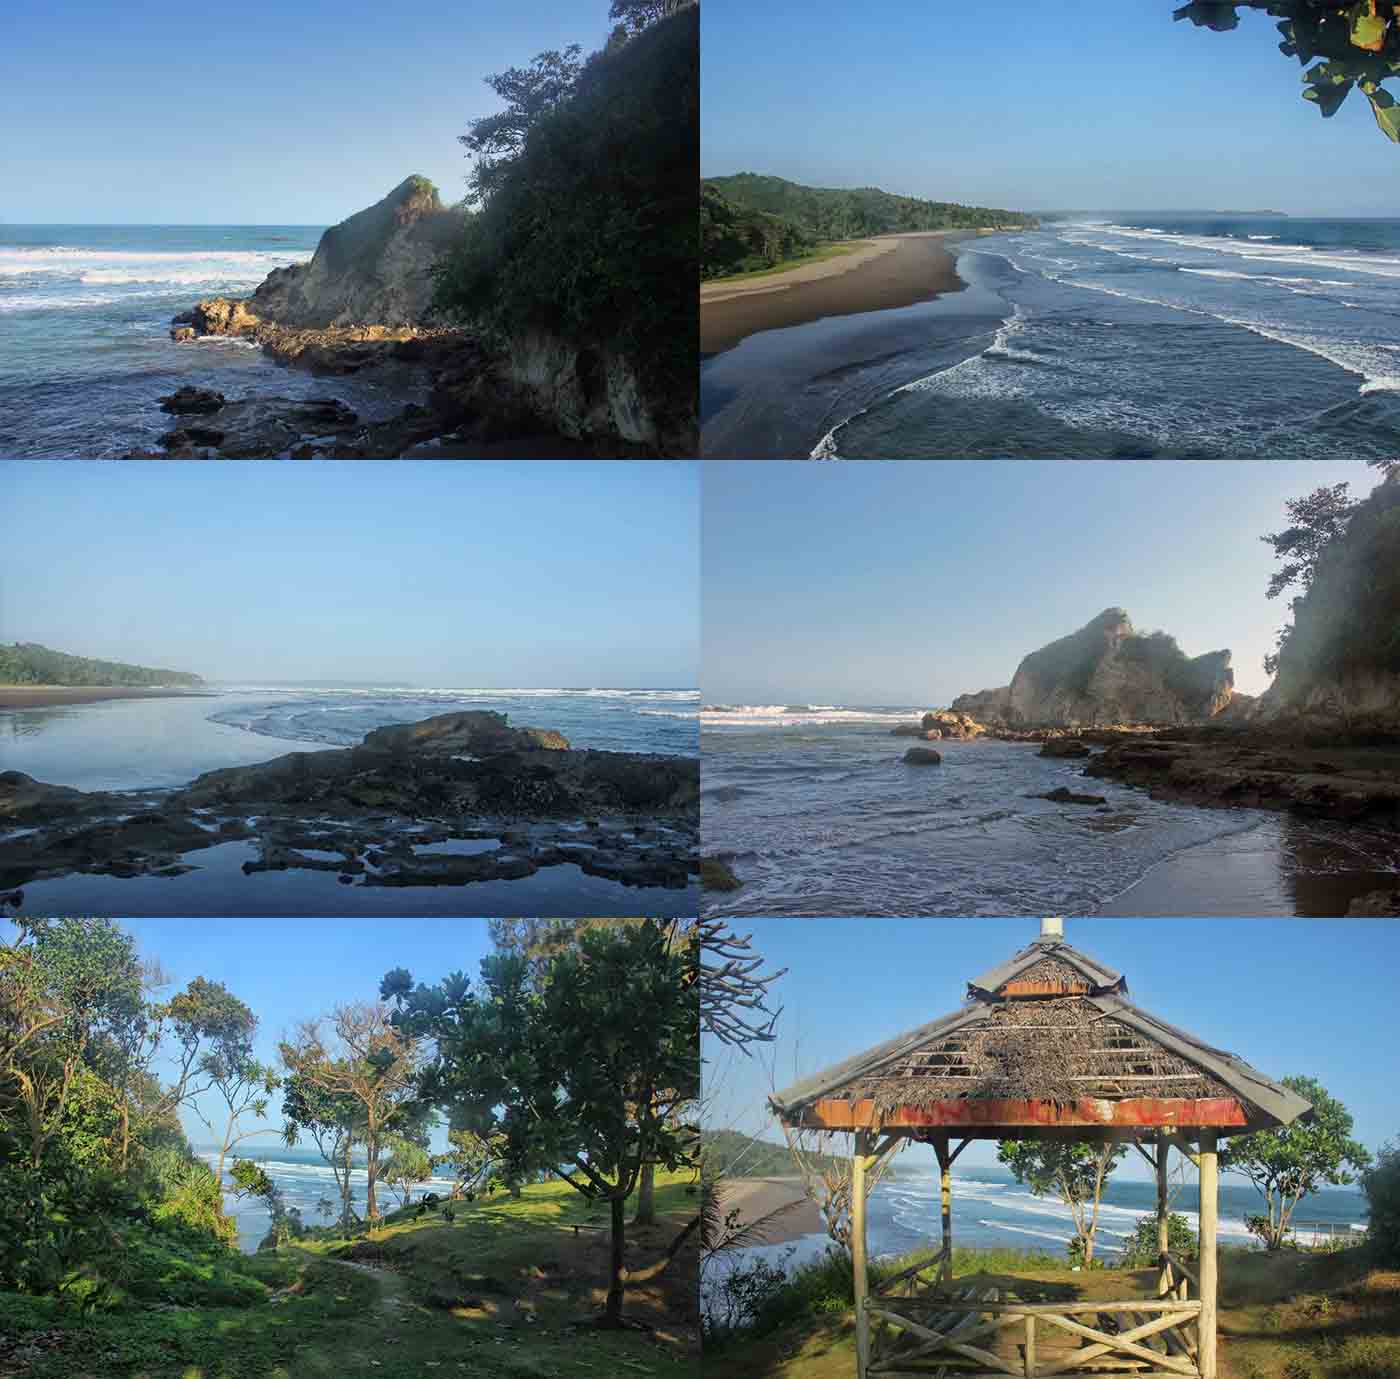 Pantai Karang Nini, Pantai Eksotis Berselimut Legenda